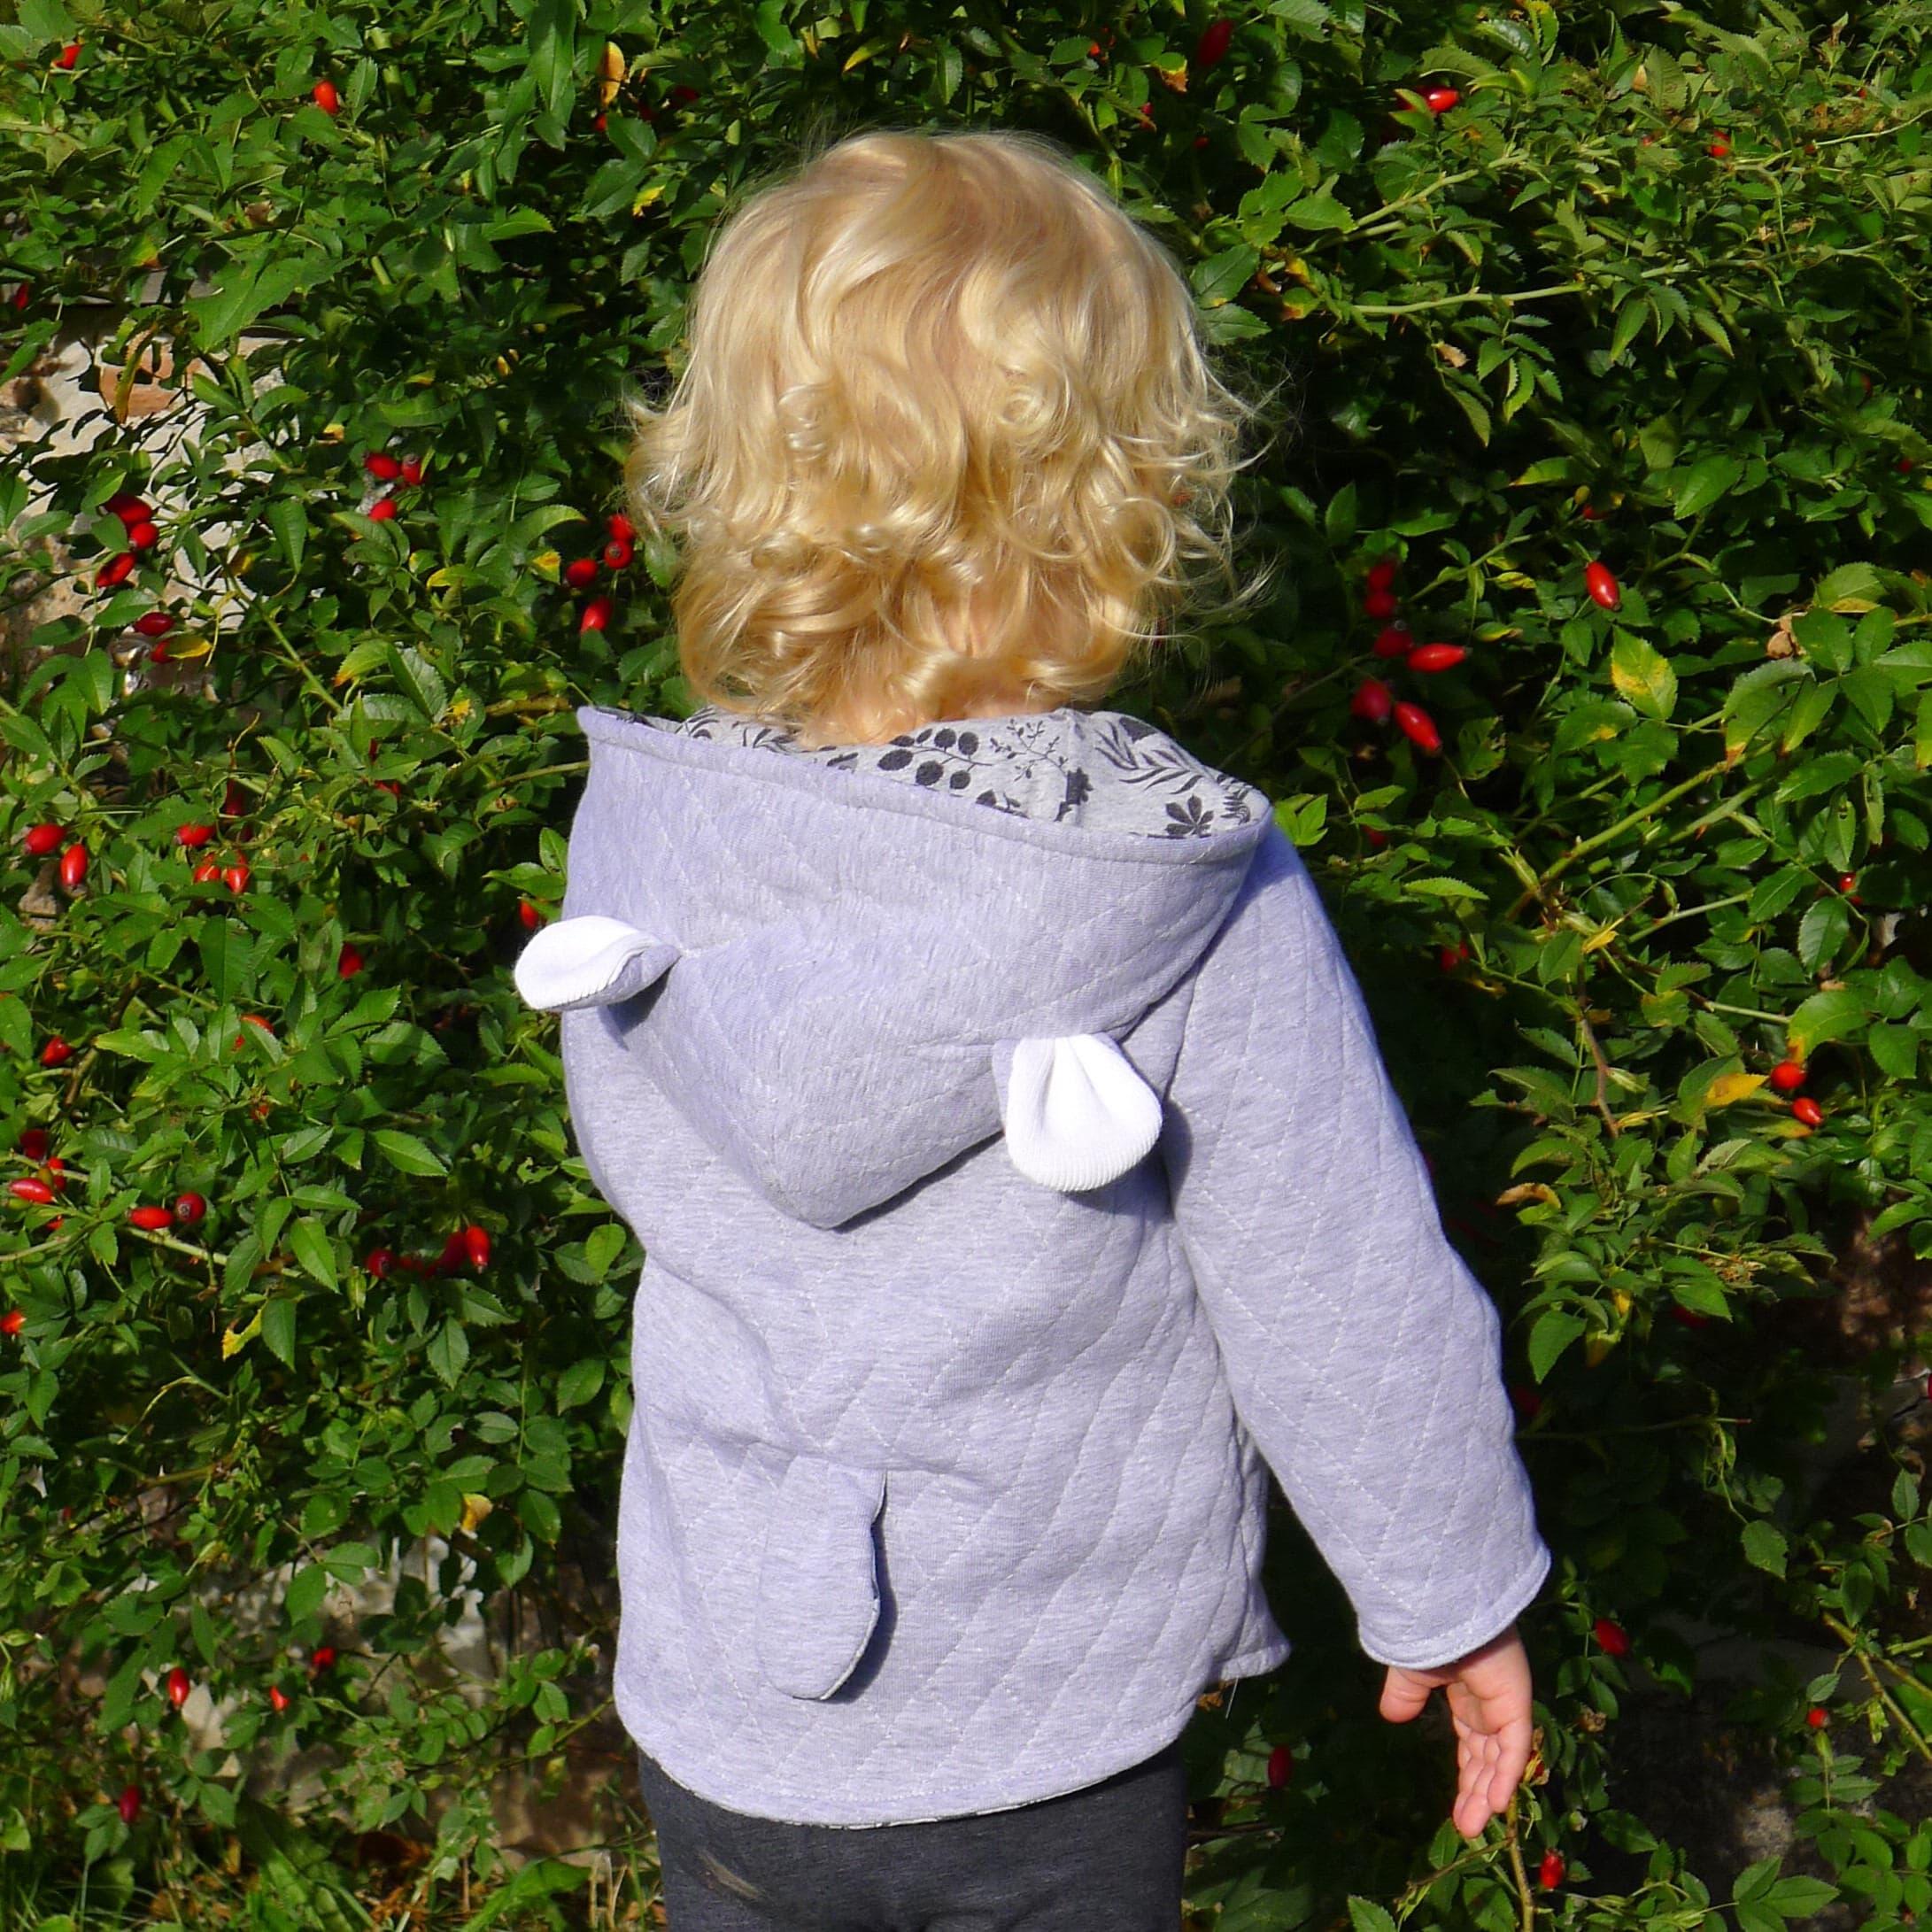 c7a48b3c7 Reversible bear jacket duffle coat quilted jacket padded | Etsy